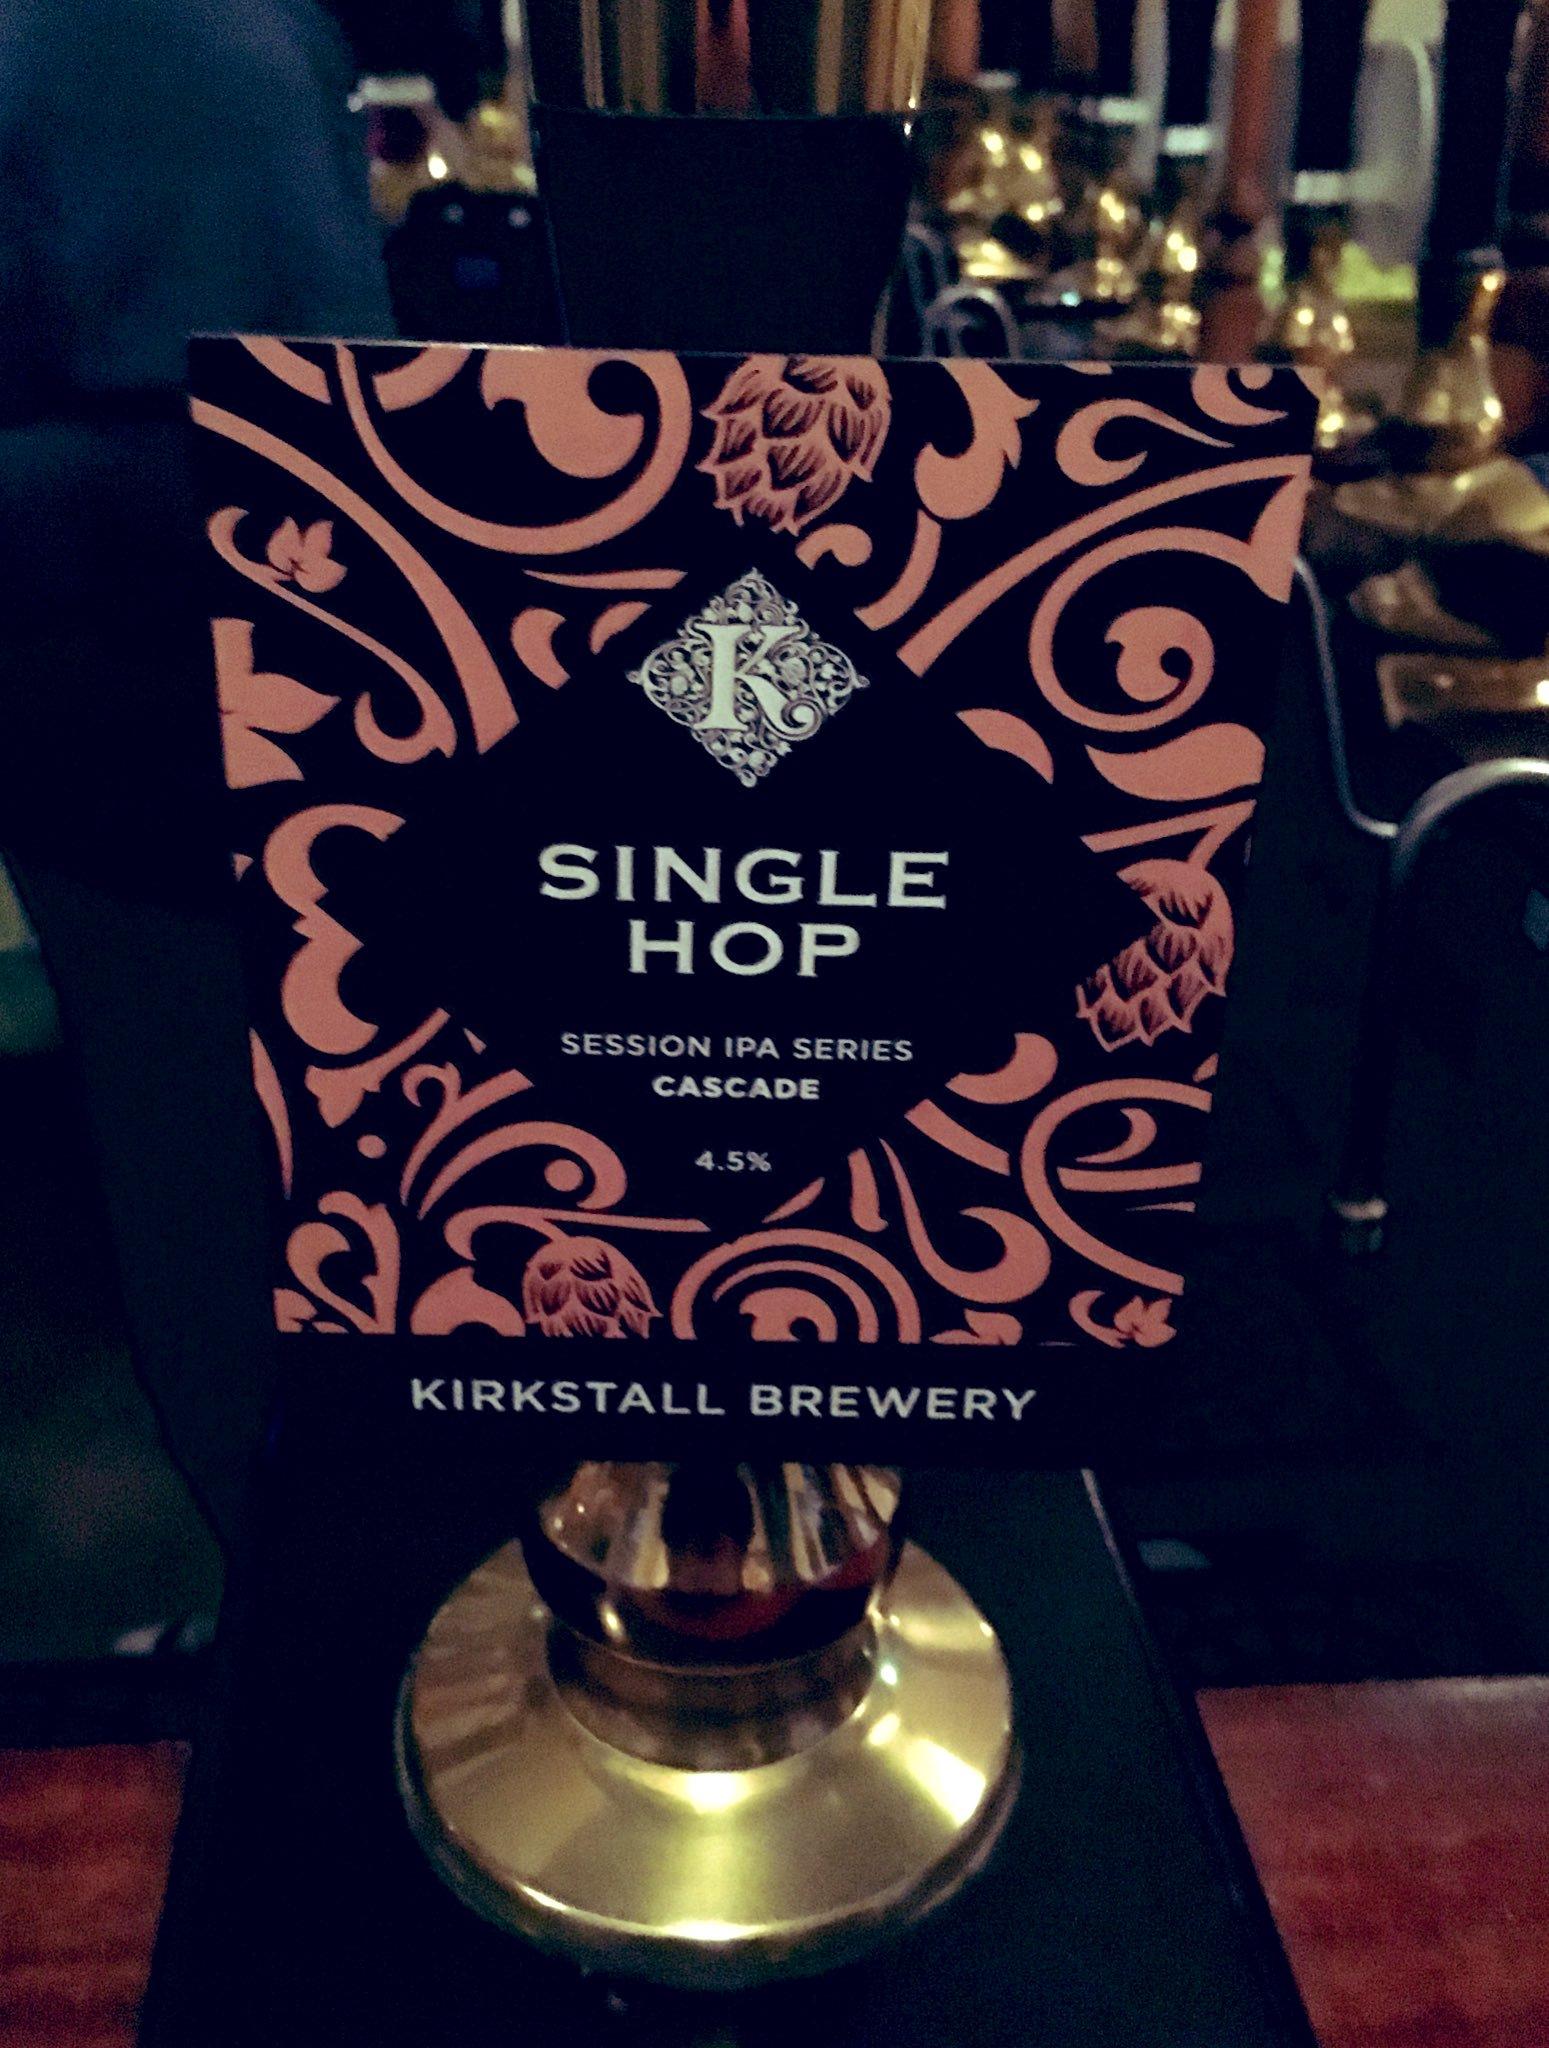 263: Single Hop